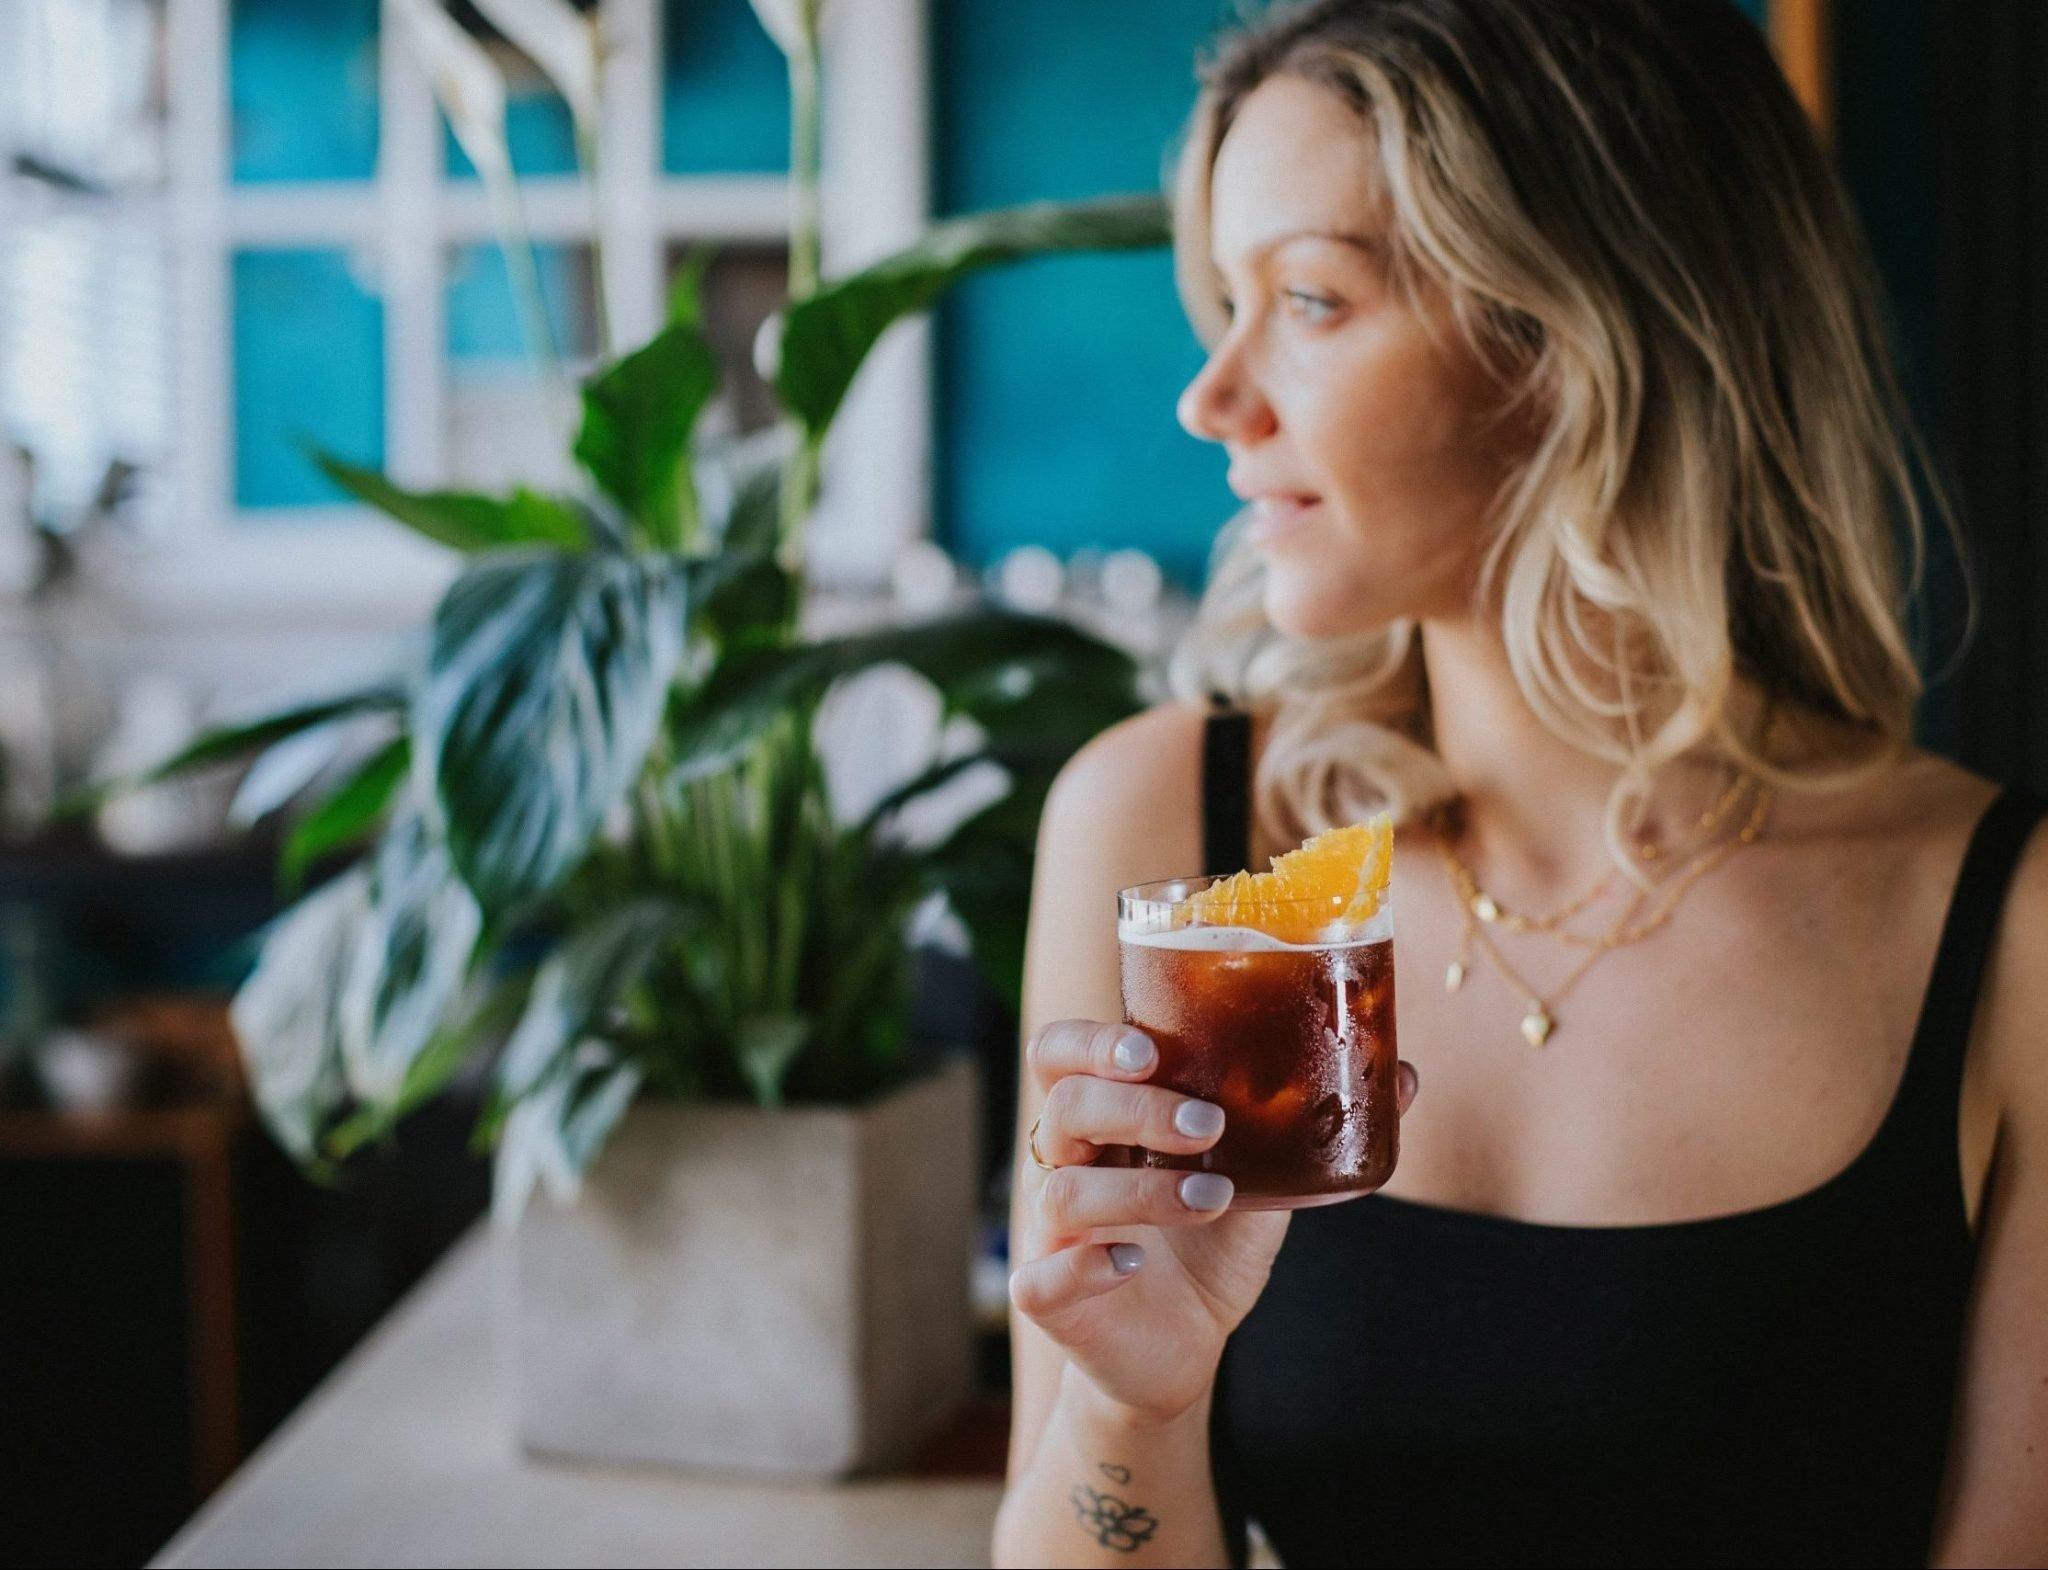 Mindful drinking La Maison Wellness founder Camille Vidal